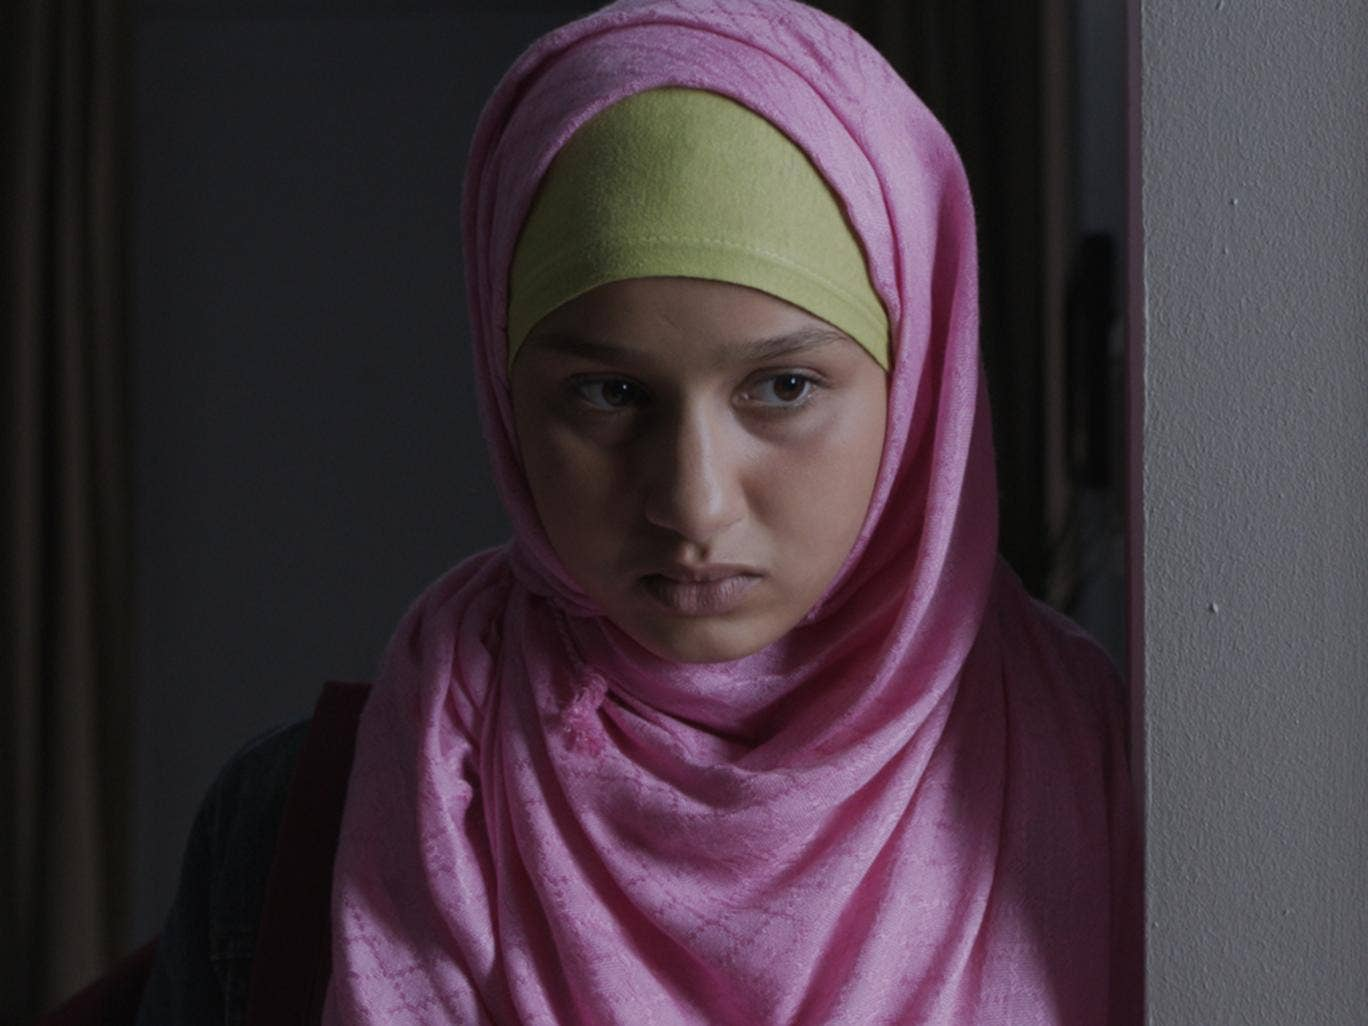 jones mills muslim women dating site Zoosk is a fun simple way to meet jones mills muslim singles online interested in dating date smarter date online with zoosk.